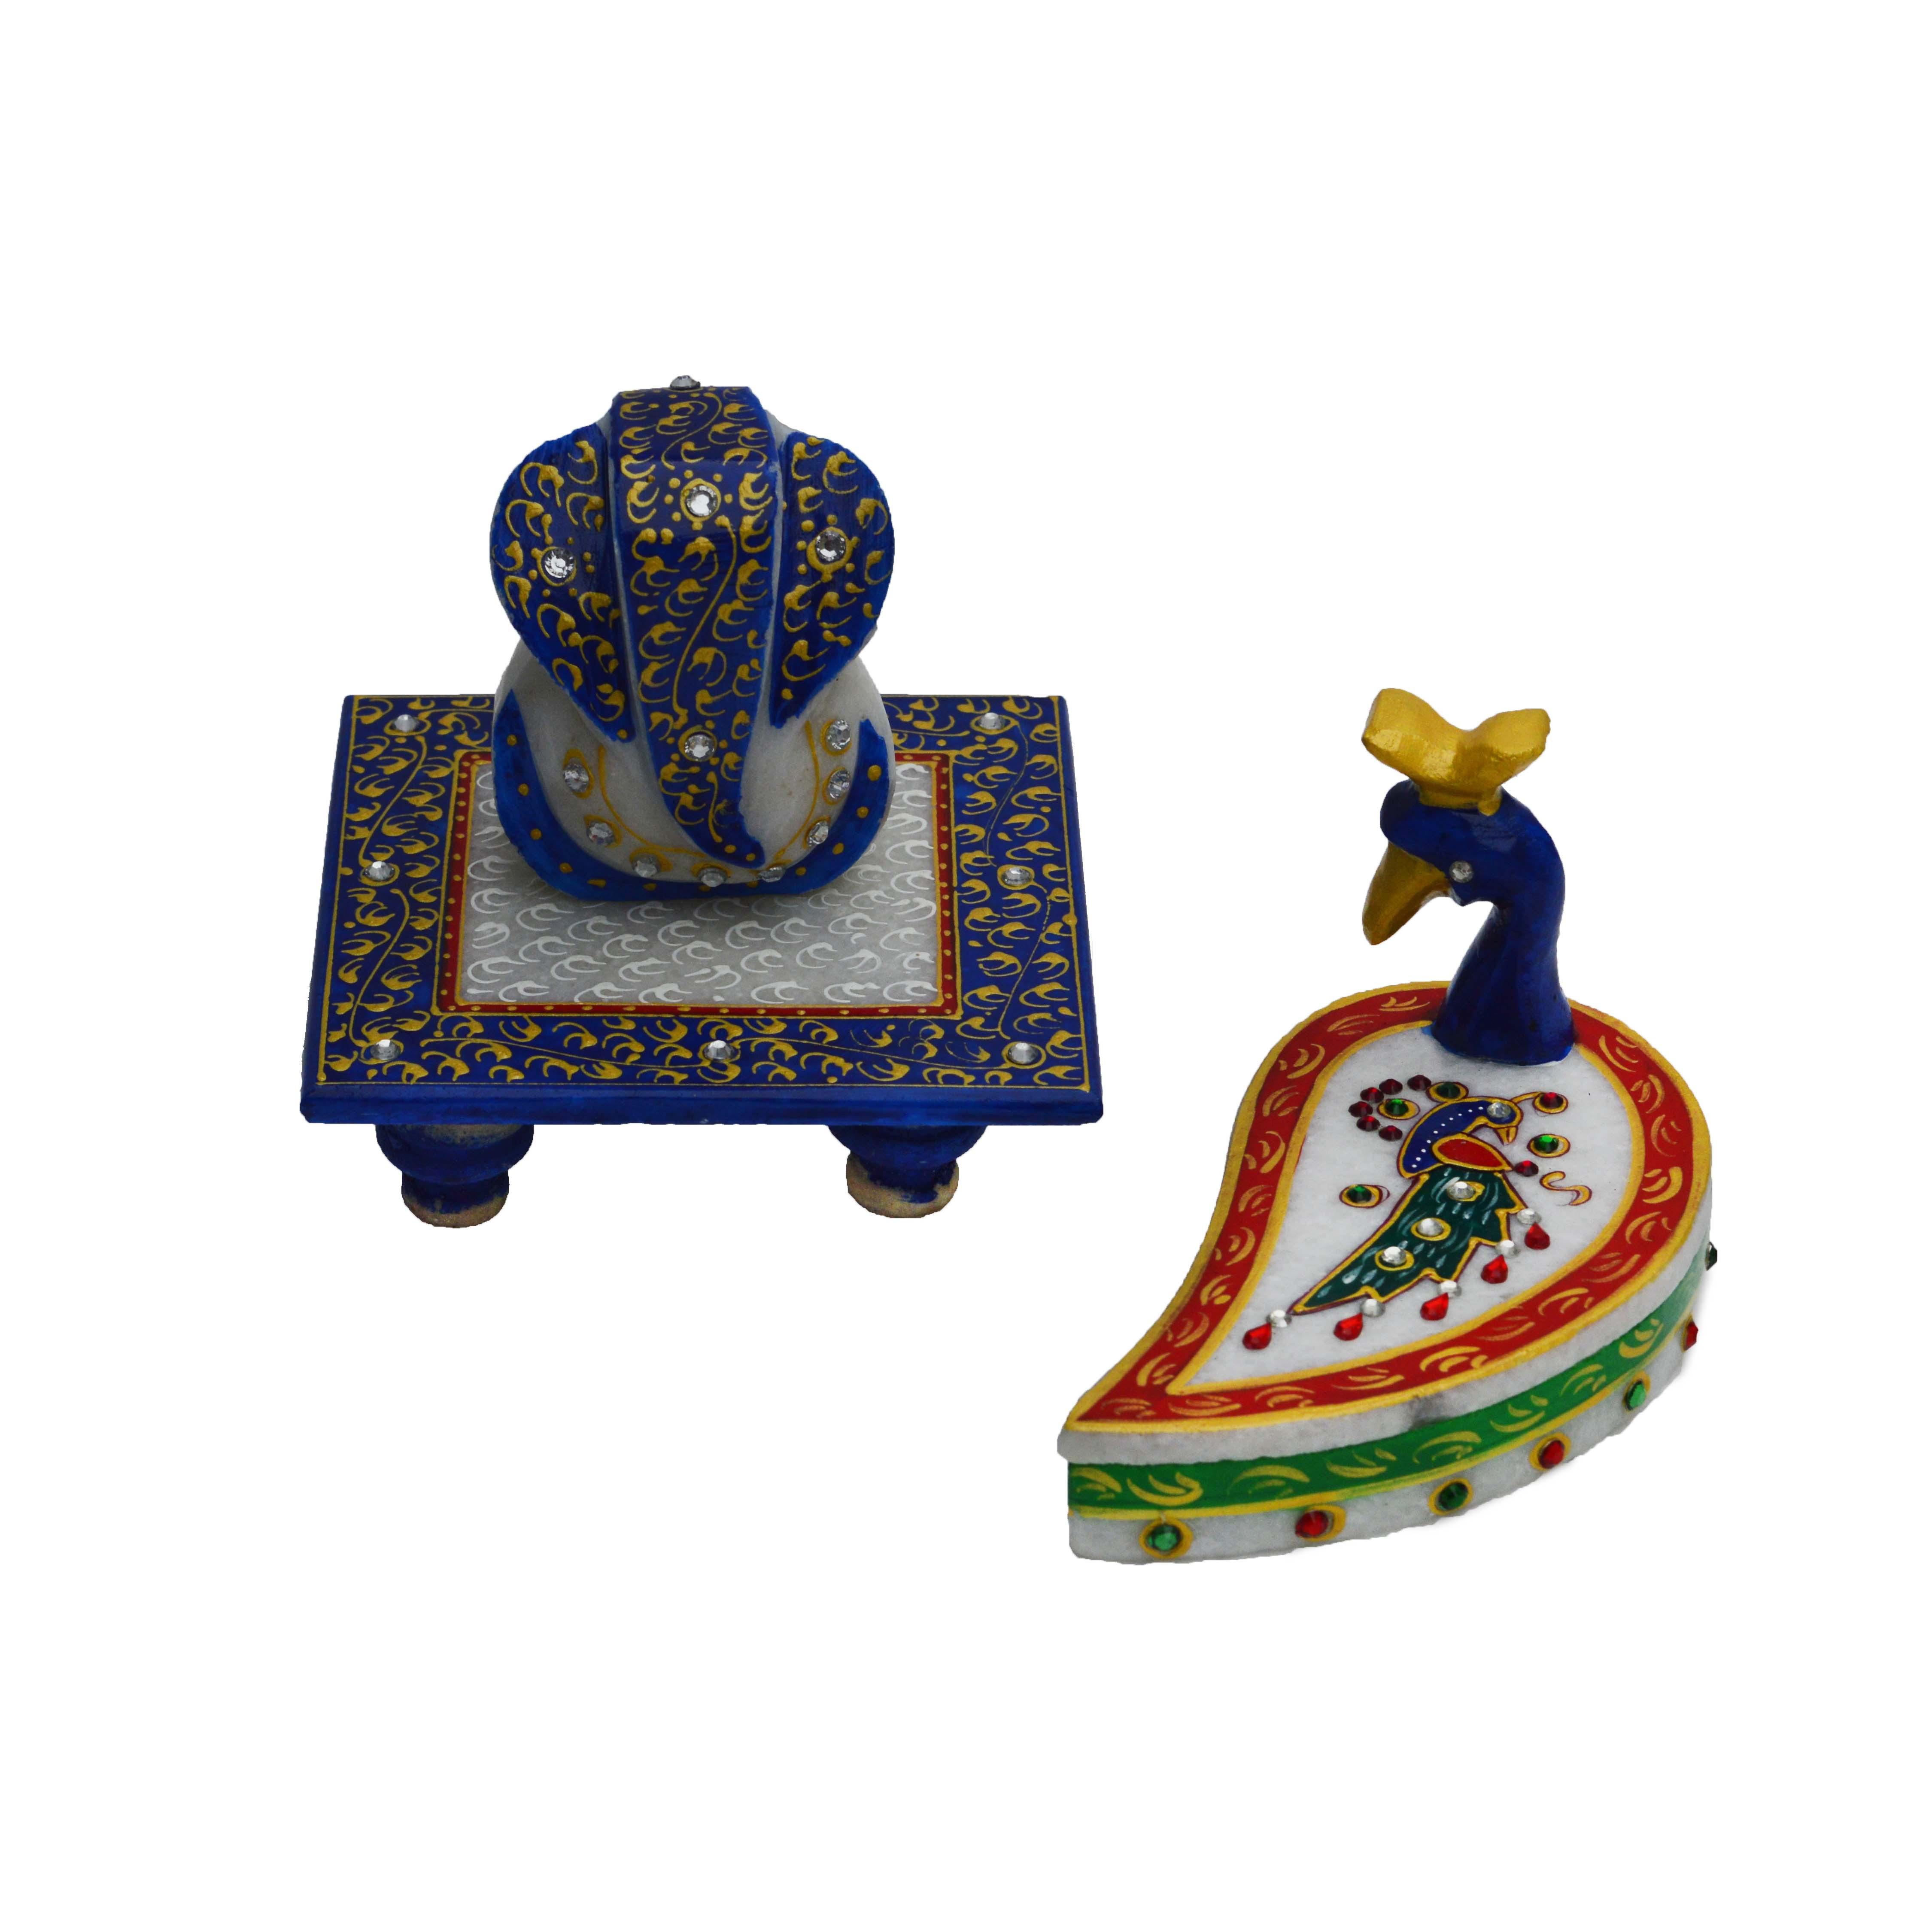 Set of Marble Ganesha Chowki and Mayur Chopra Indian Home Decor